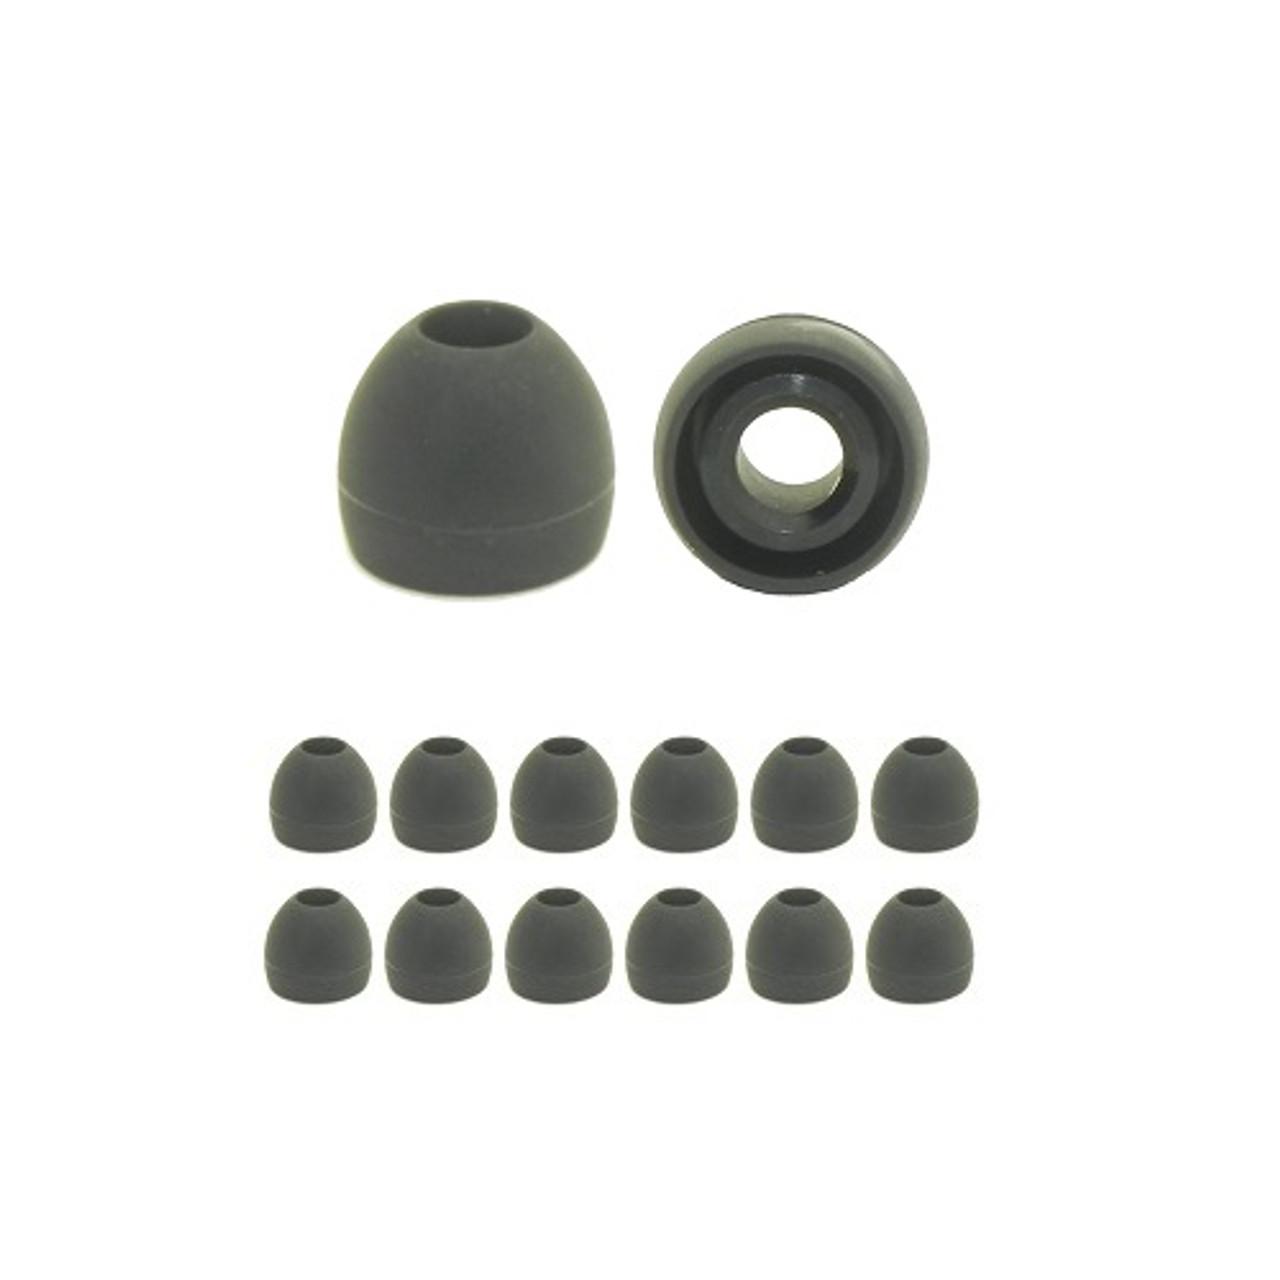 6 Memory foams Earbud Ear Tips for ALTEC LANSING BackBeat,Bliss,Muzx,MZX399-DR